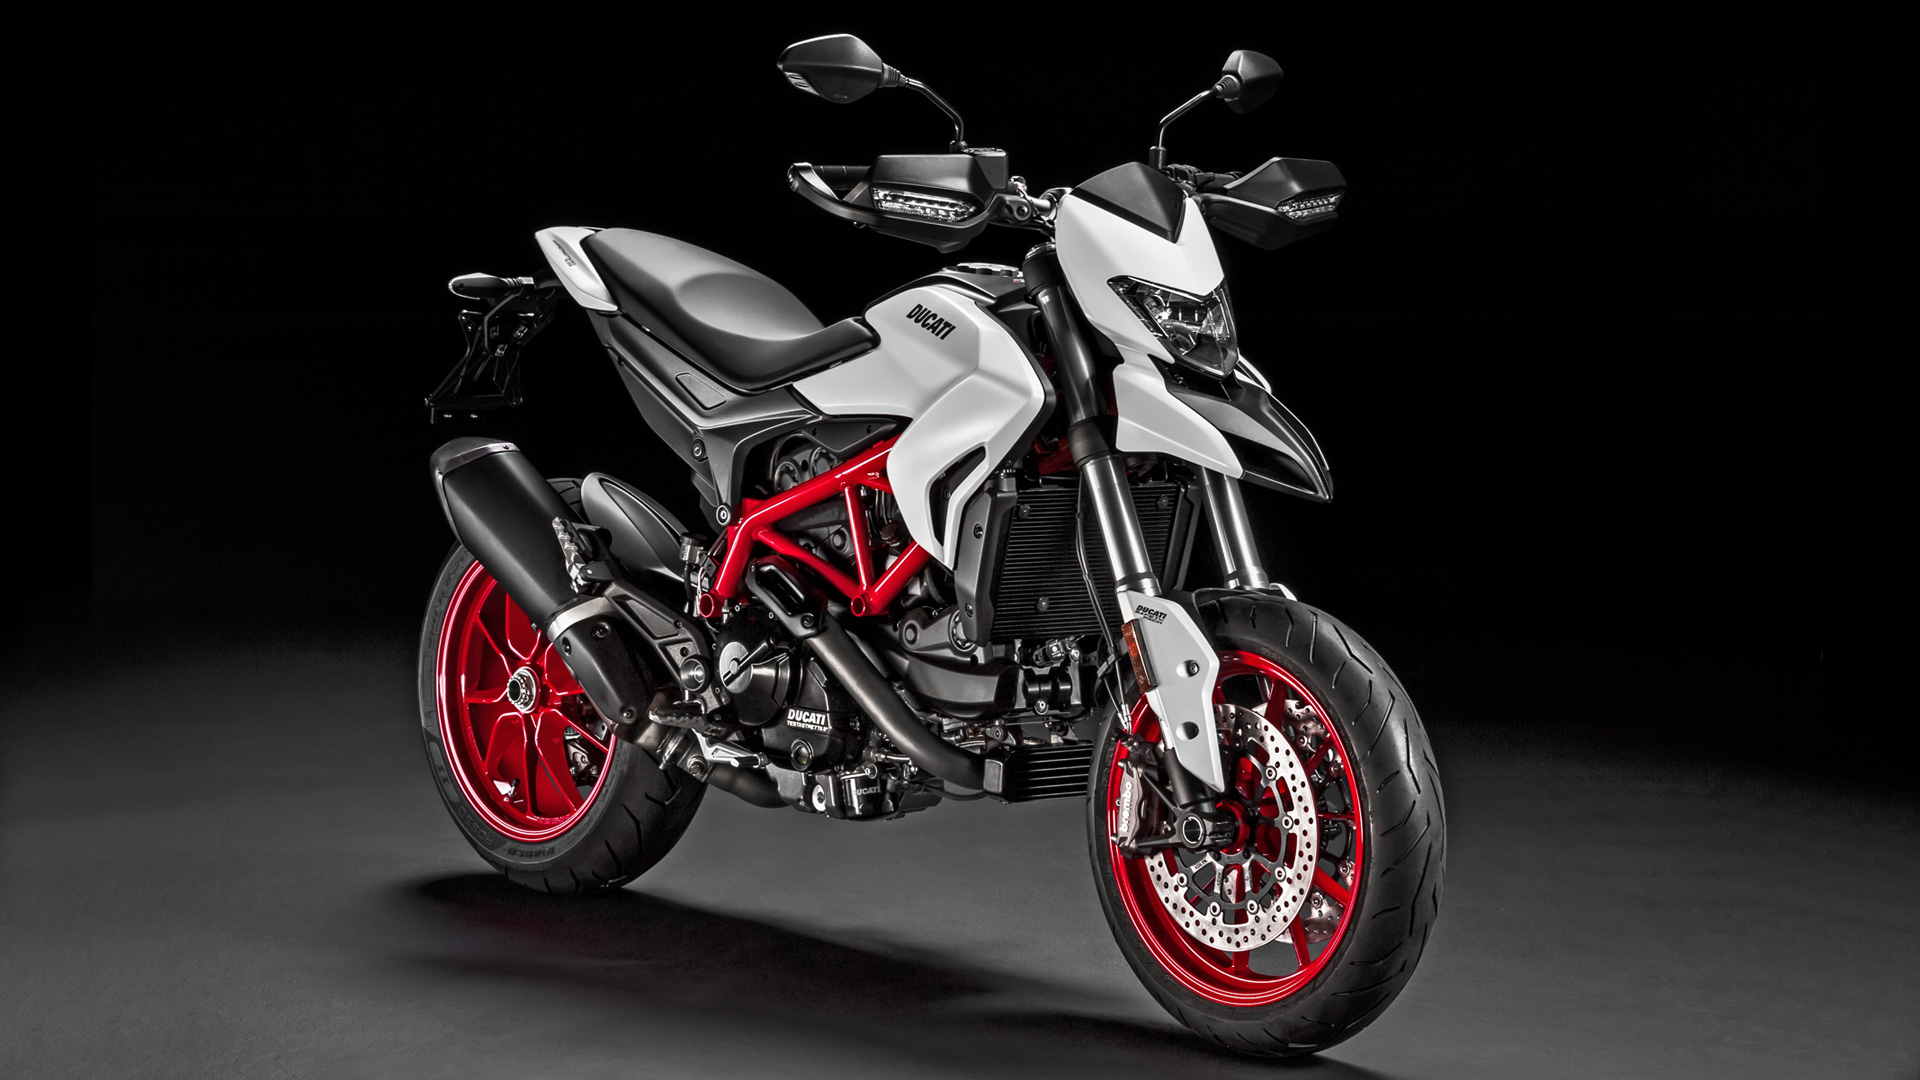 Ducati Hypermotard Touring